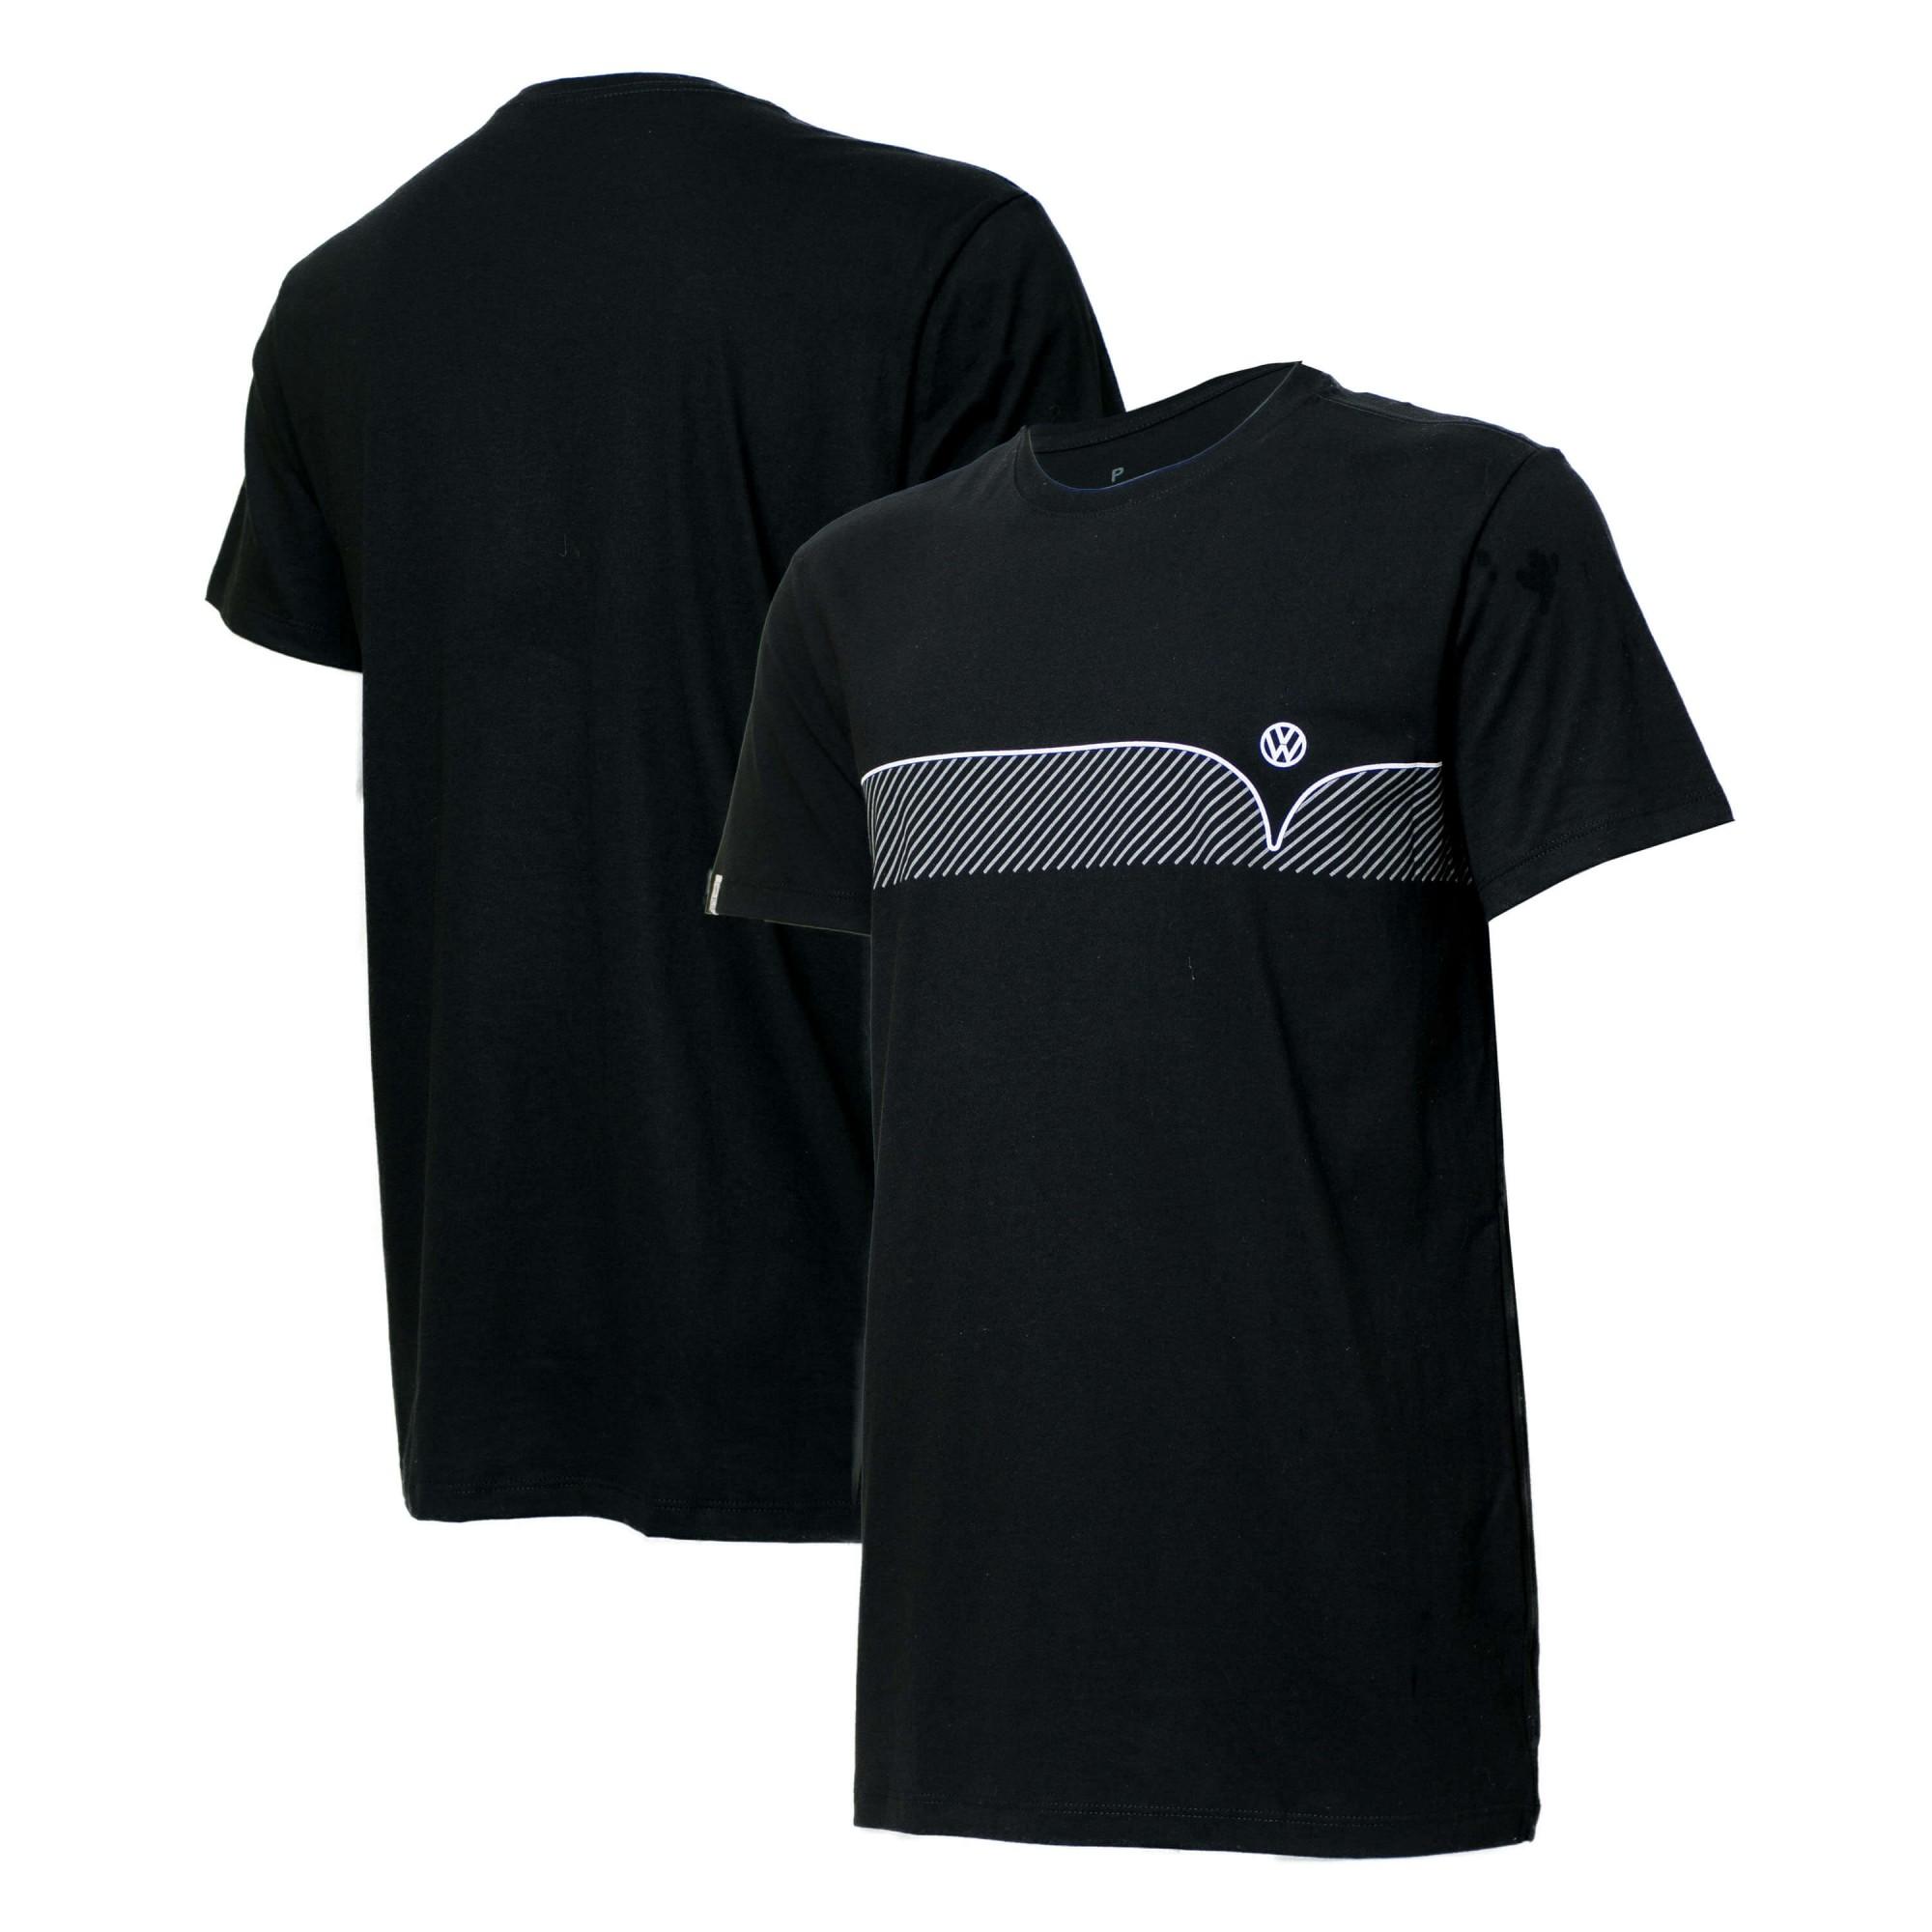 Camiseta VW Kombi Lines - Preta